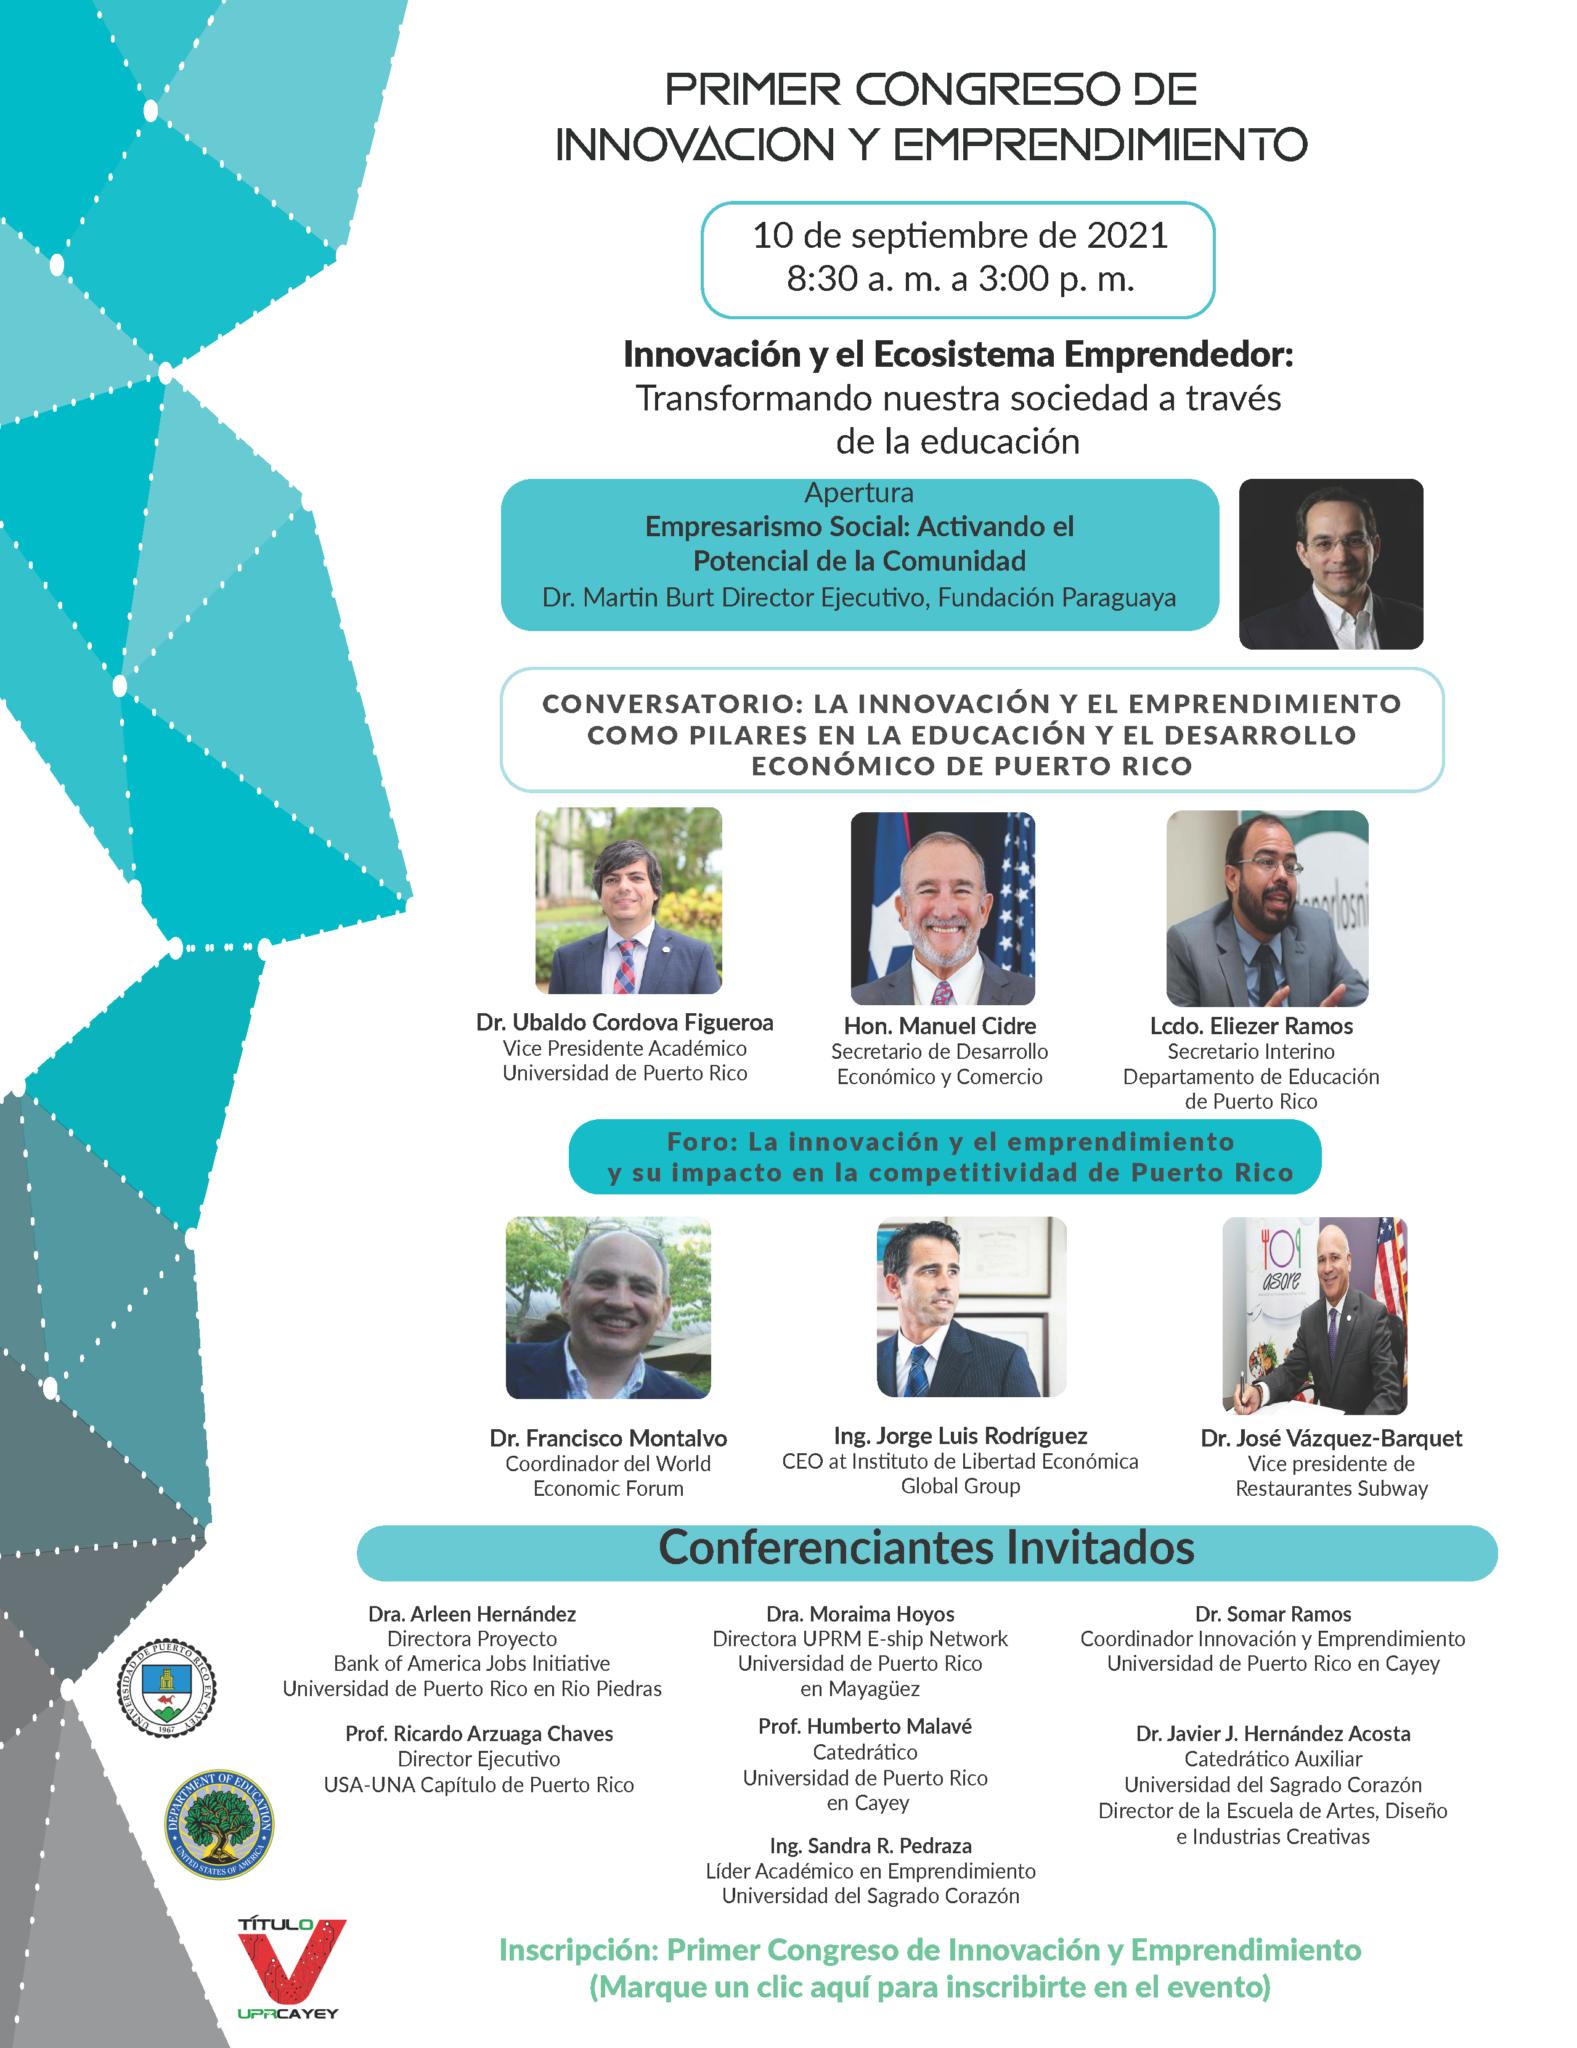 Imagen promoción a la actividad First Congress of Innovation and Entrepreneurship Registration